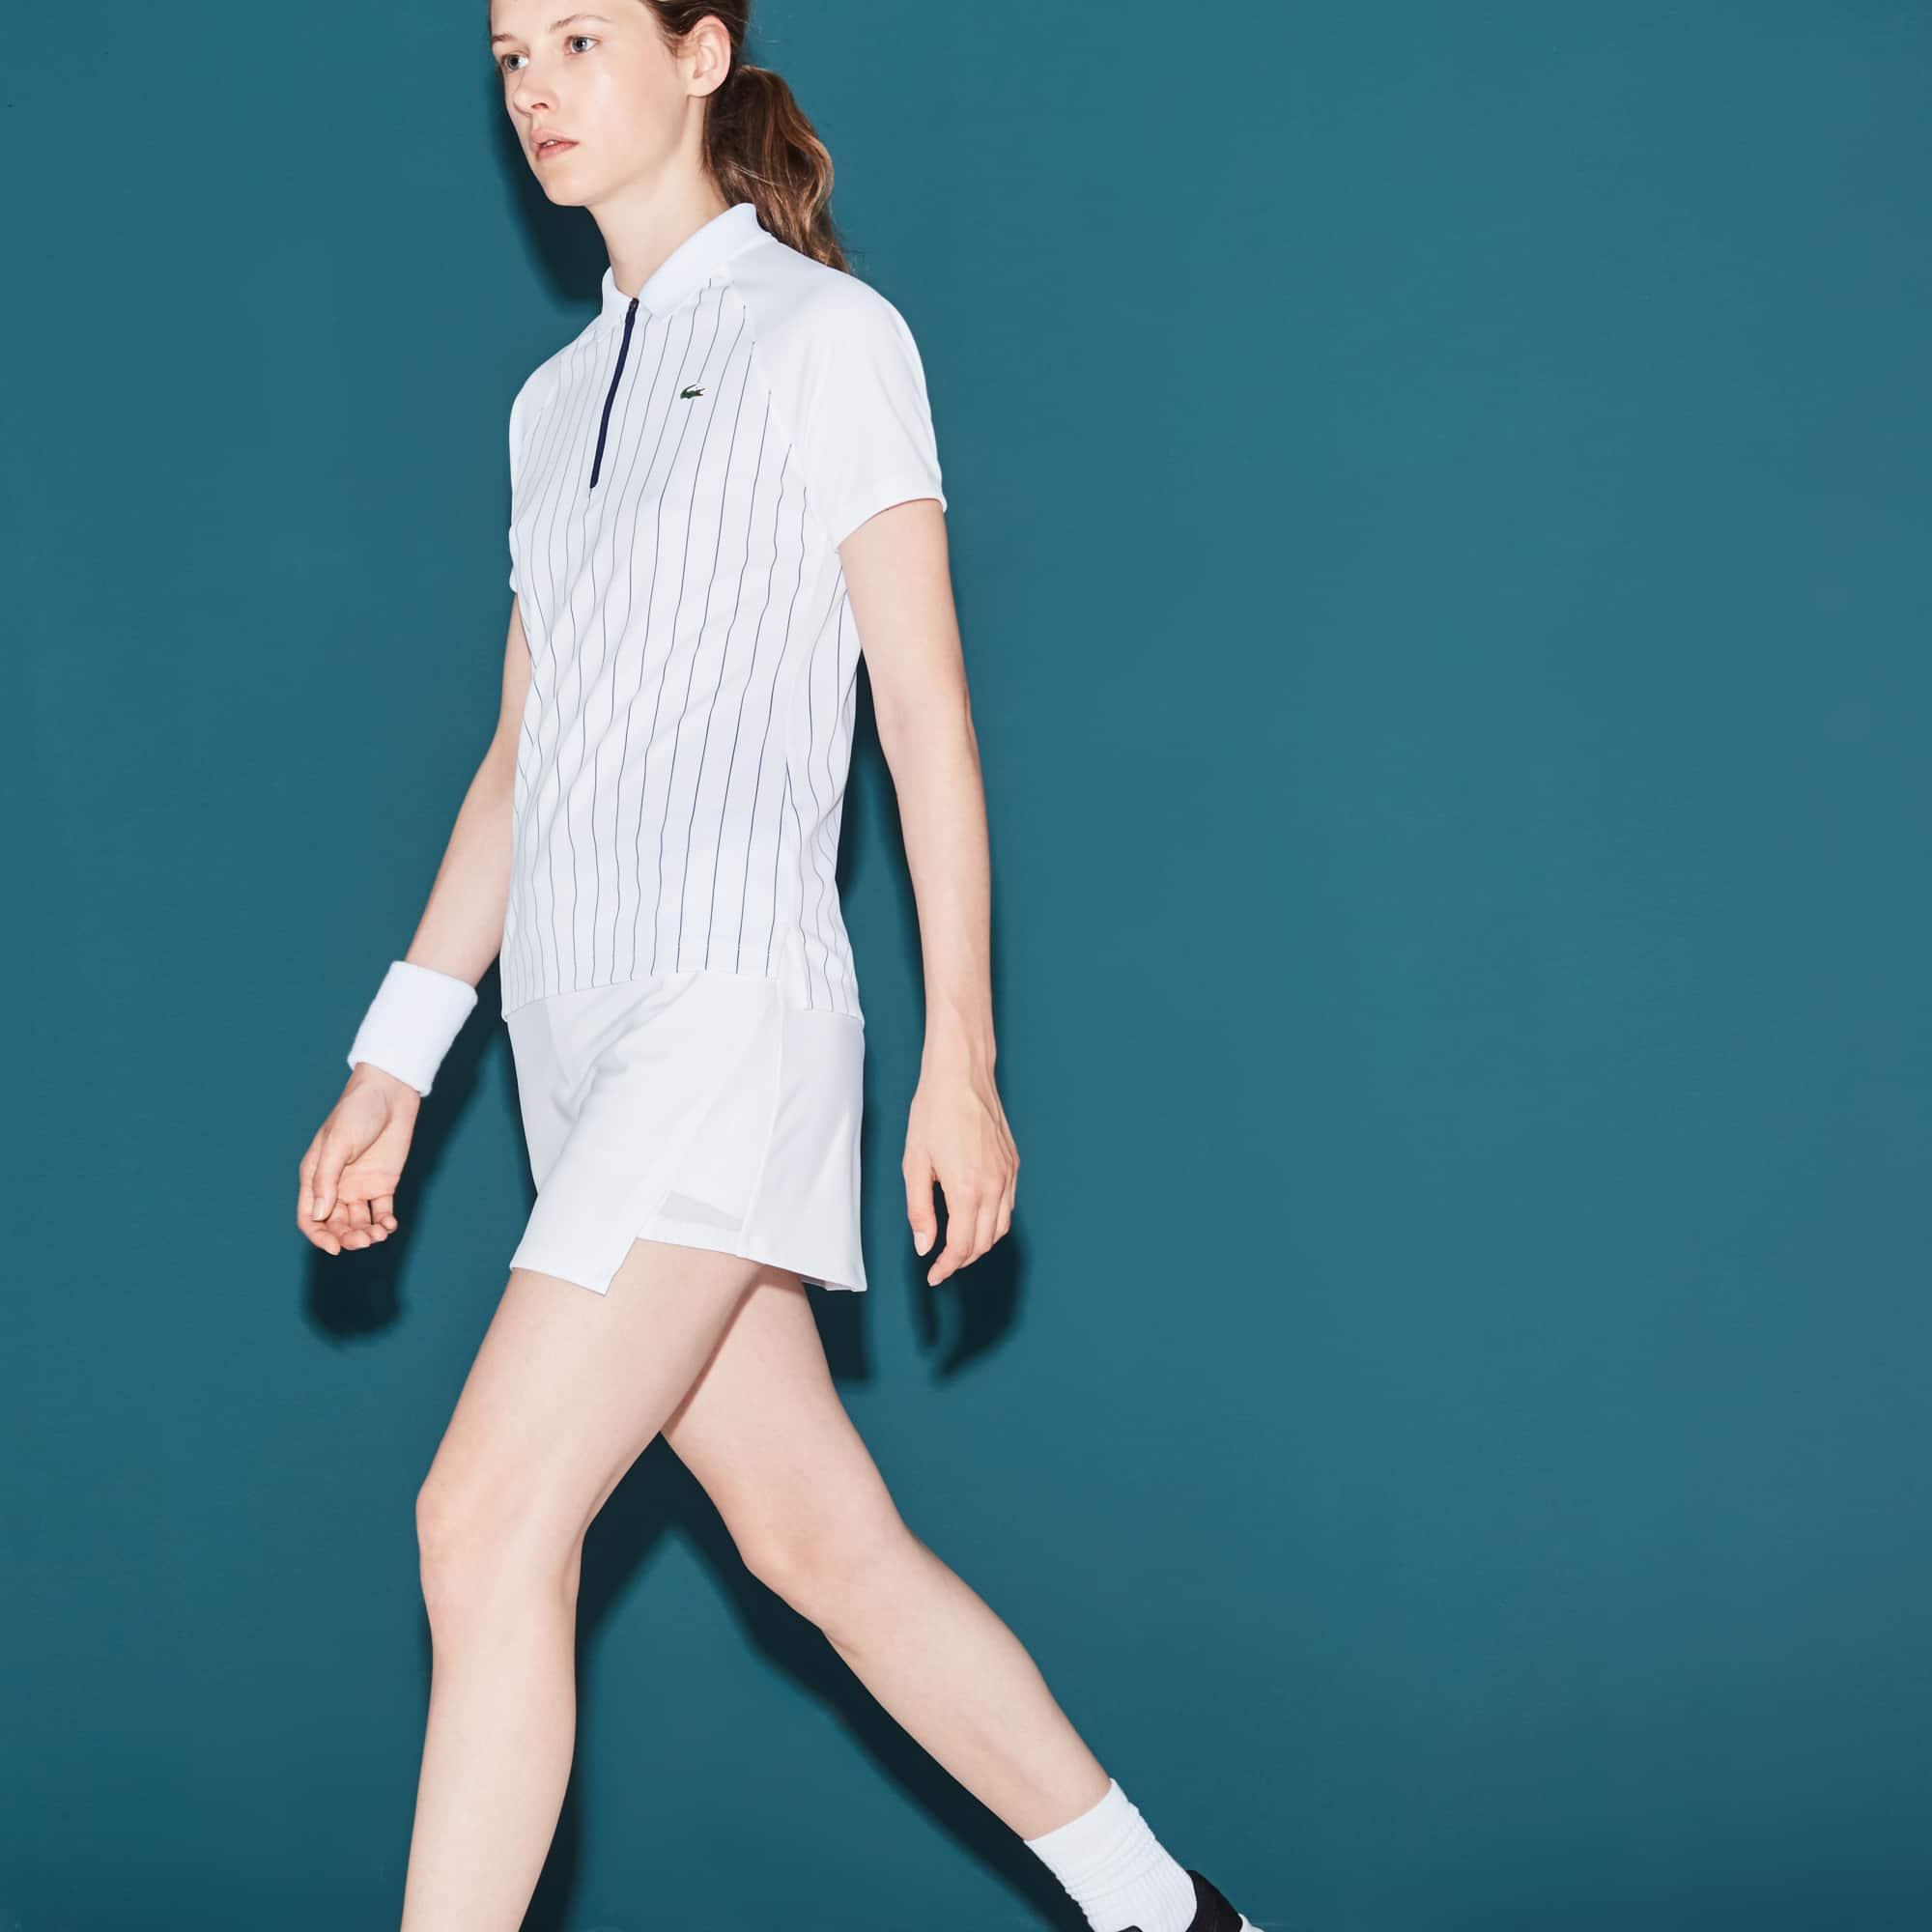 Women's  SPORT Tennis Technical Jersey Wraparound Skirt